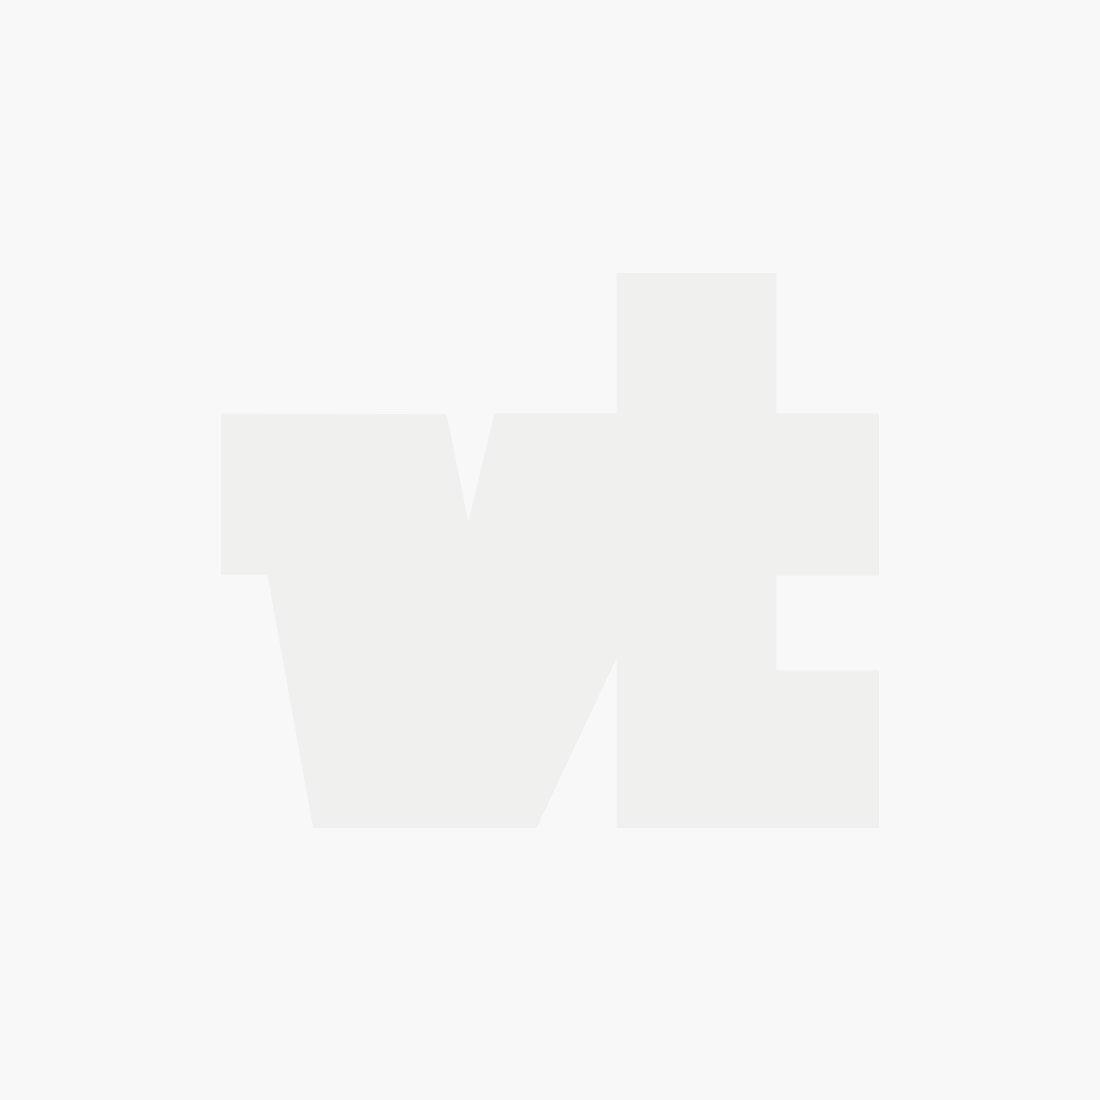 Greensboro mid. summer blue  stretch jeans